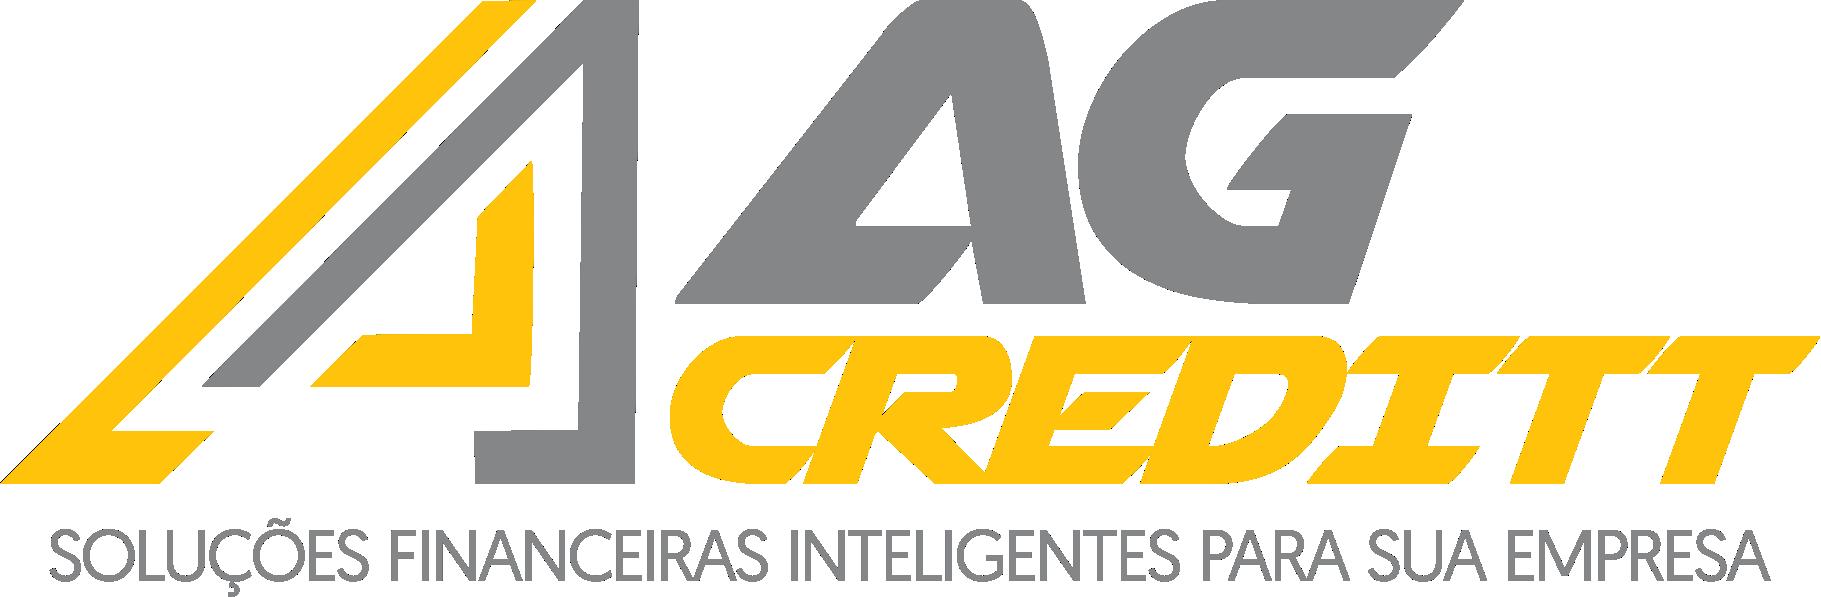 AG Creditt